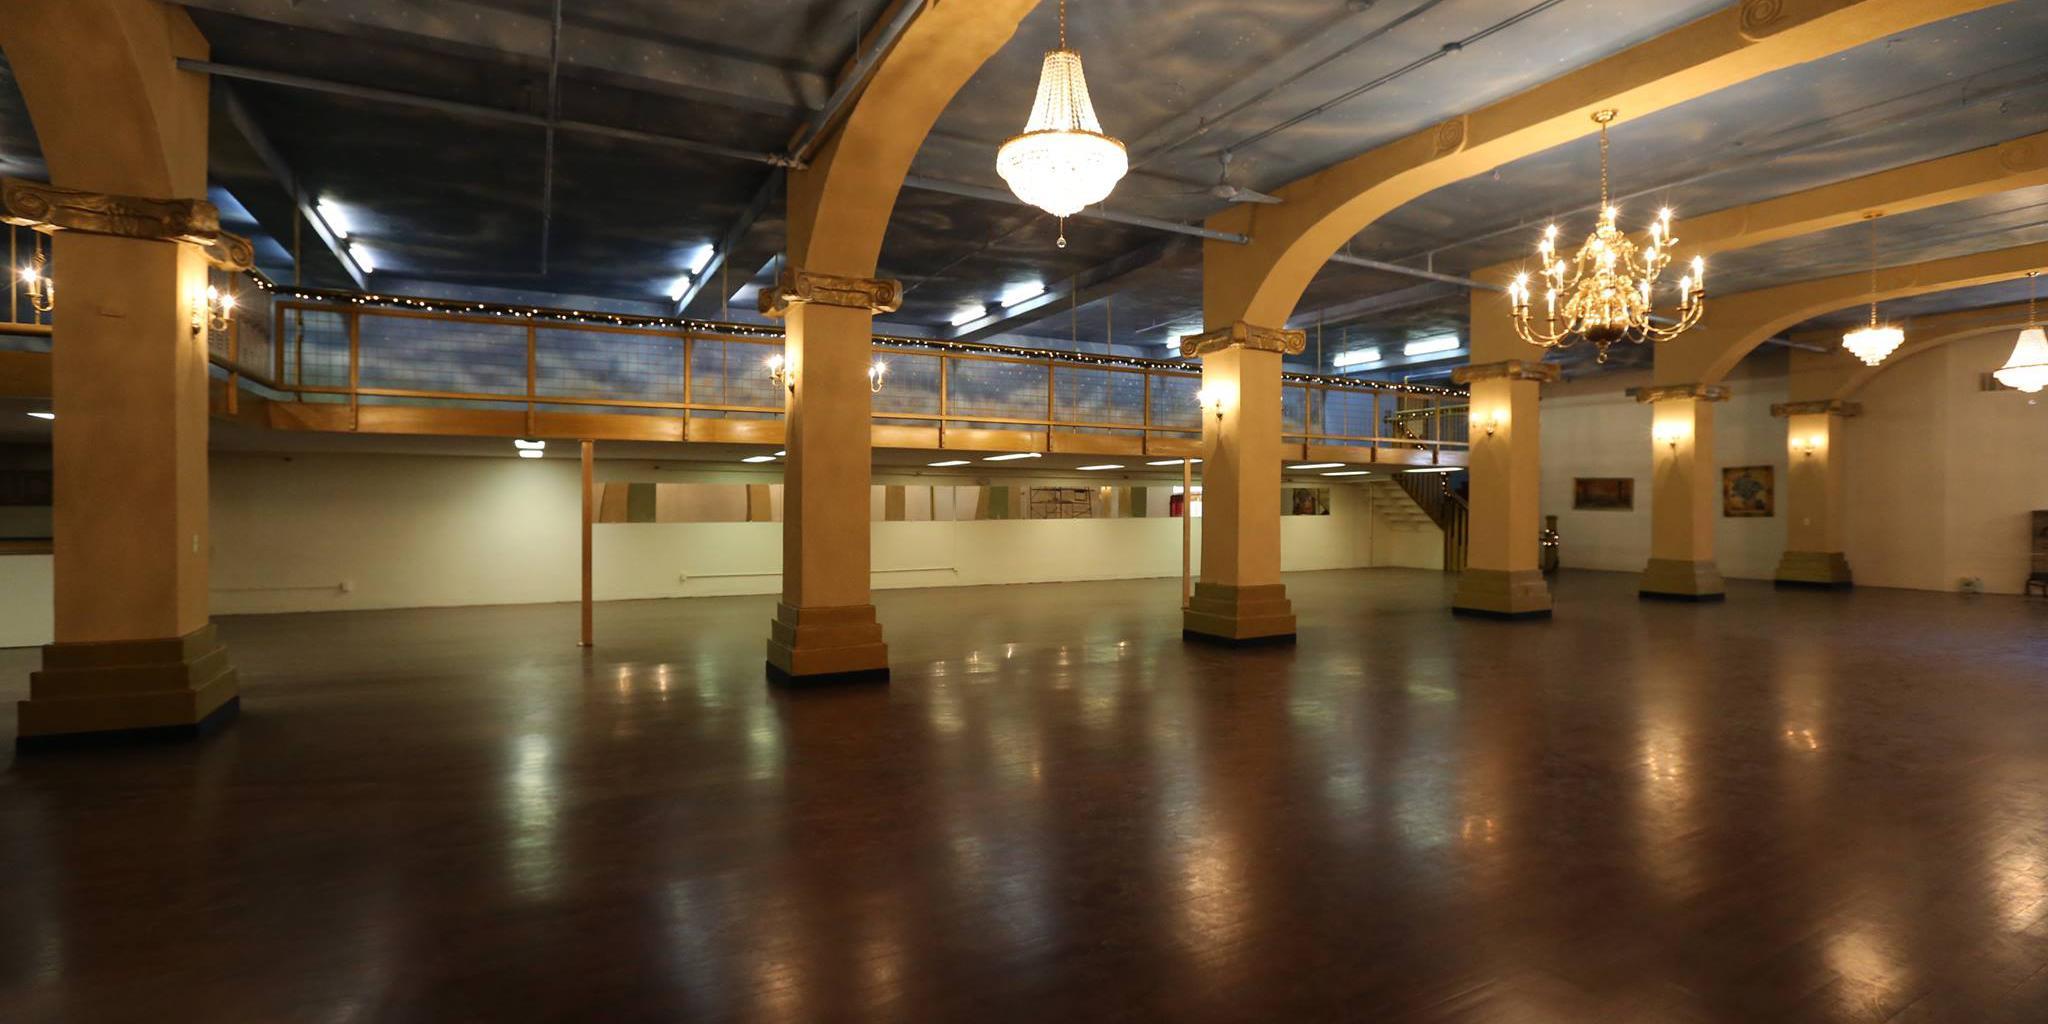 7th Street Event Center Venue Kansas City Price It Out